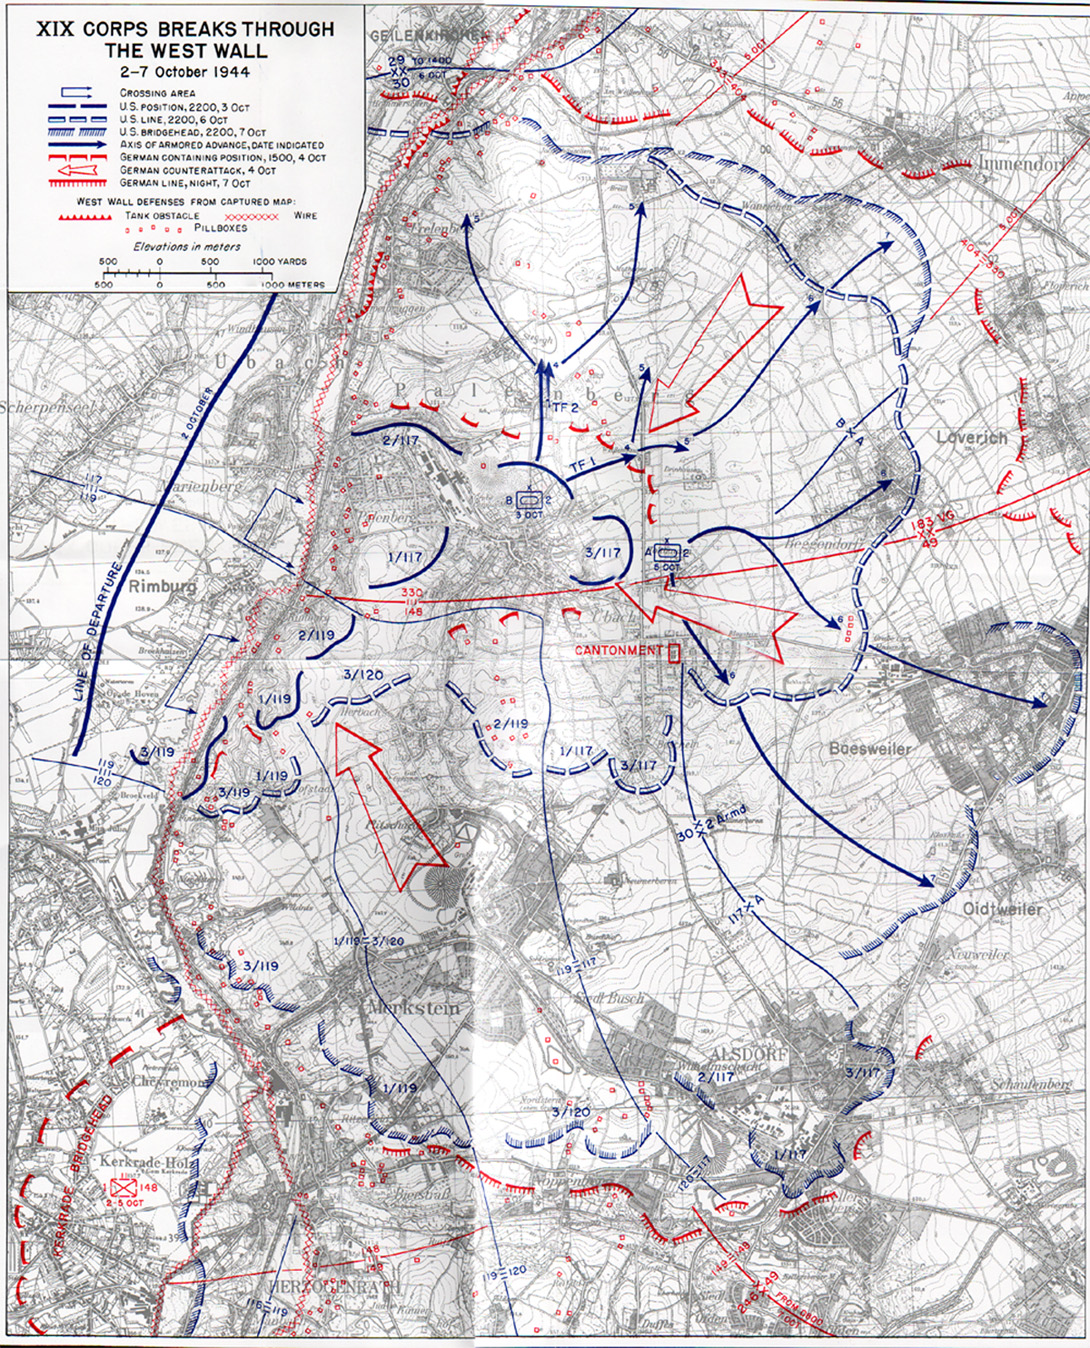 bunker deutschland karte Bunker Karte Deutschland | jooptimmer